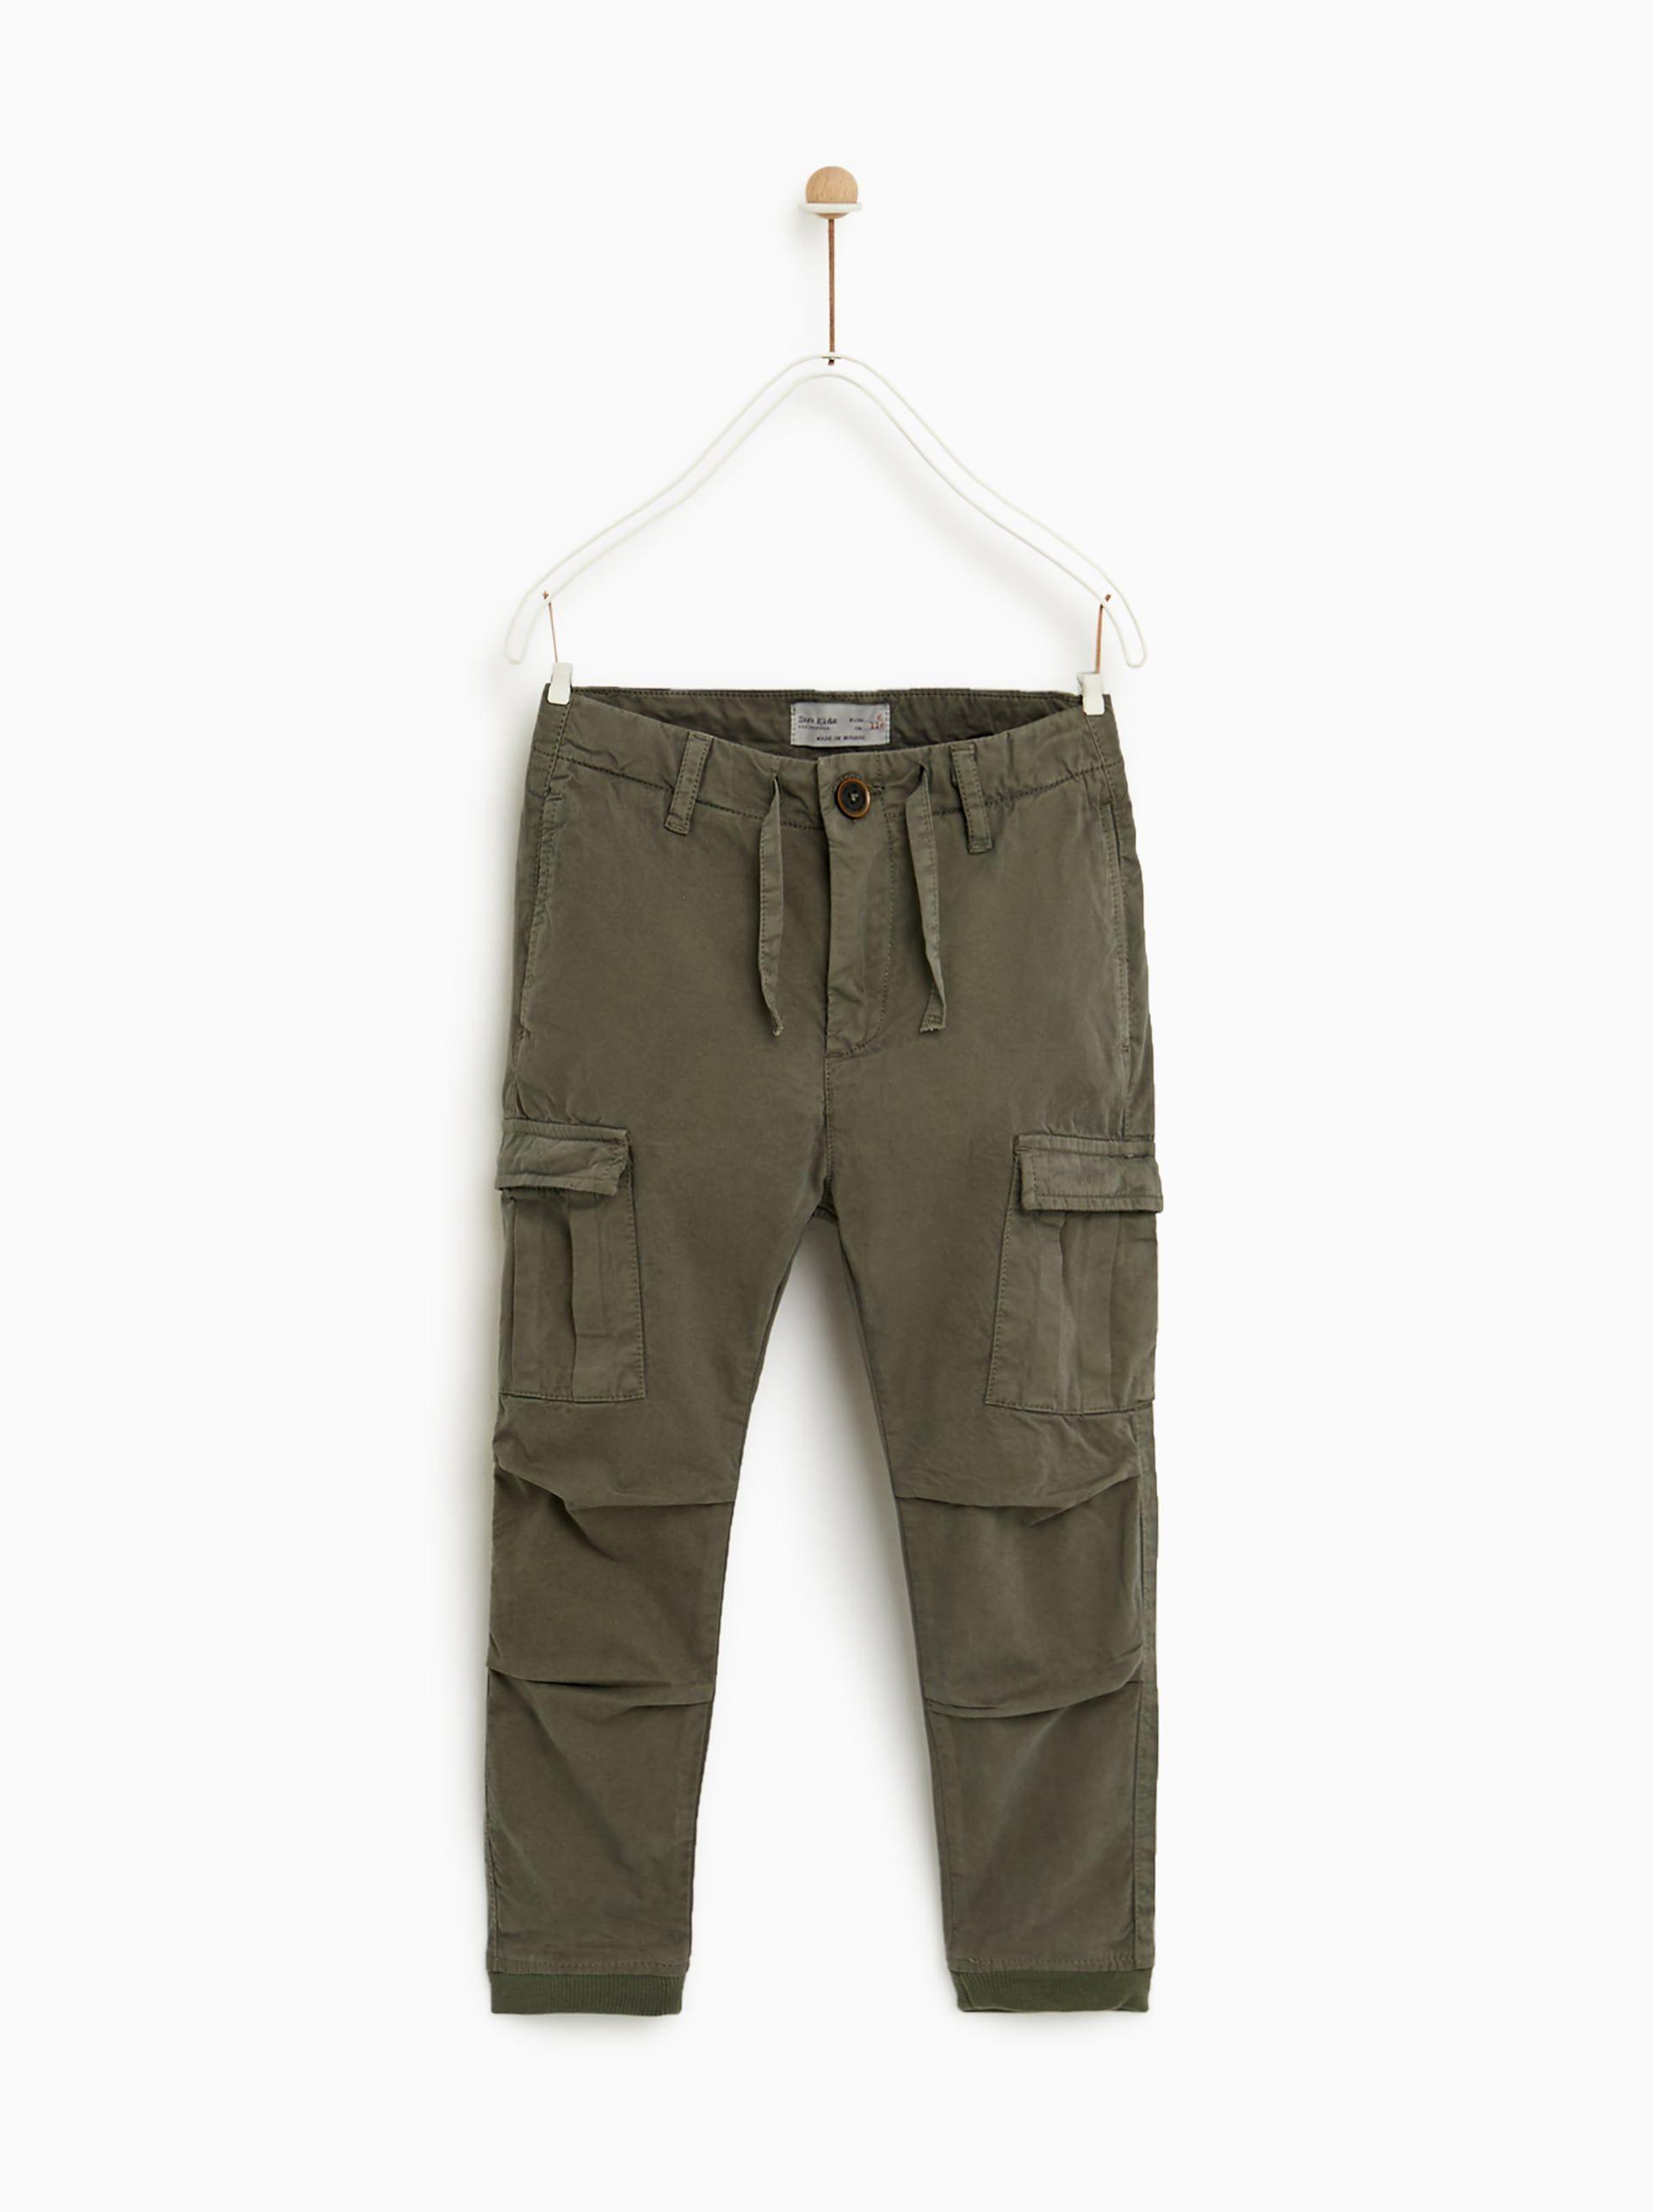 Image 1 Of Cargo Trousers From Zara Pantalones Para Ninos Pantalones Cargo Jeans Para Hombre